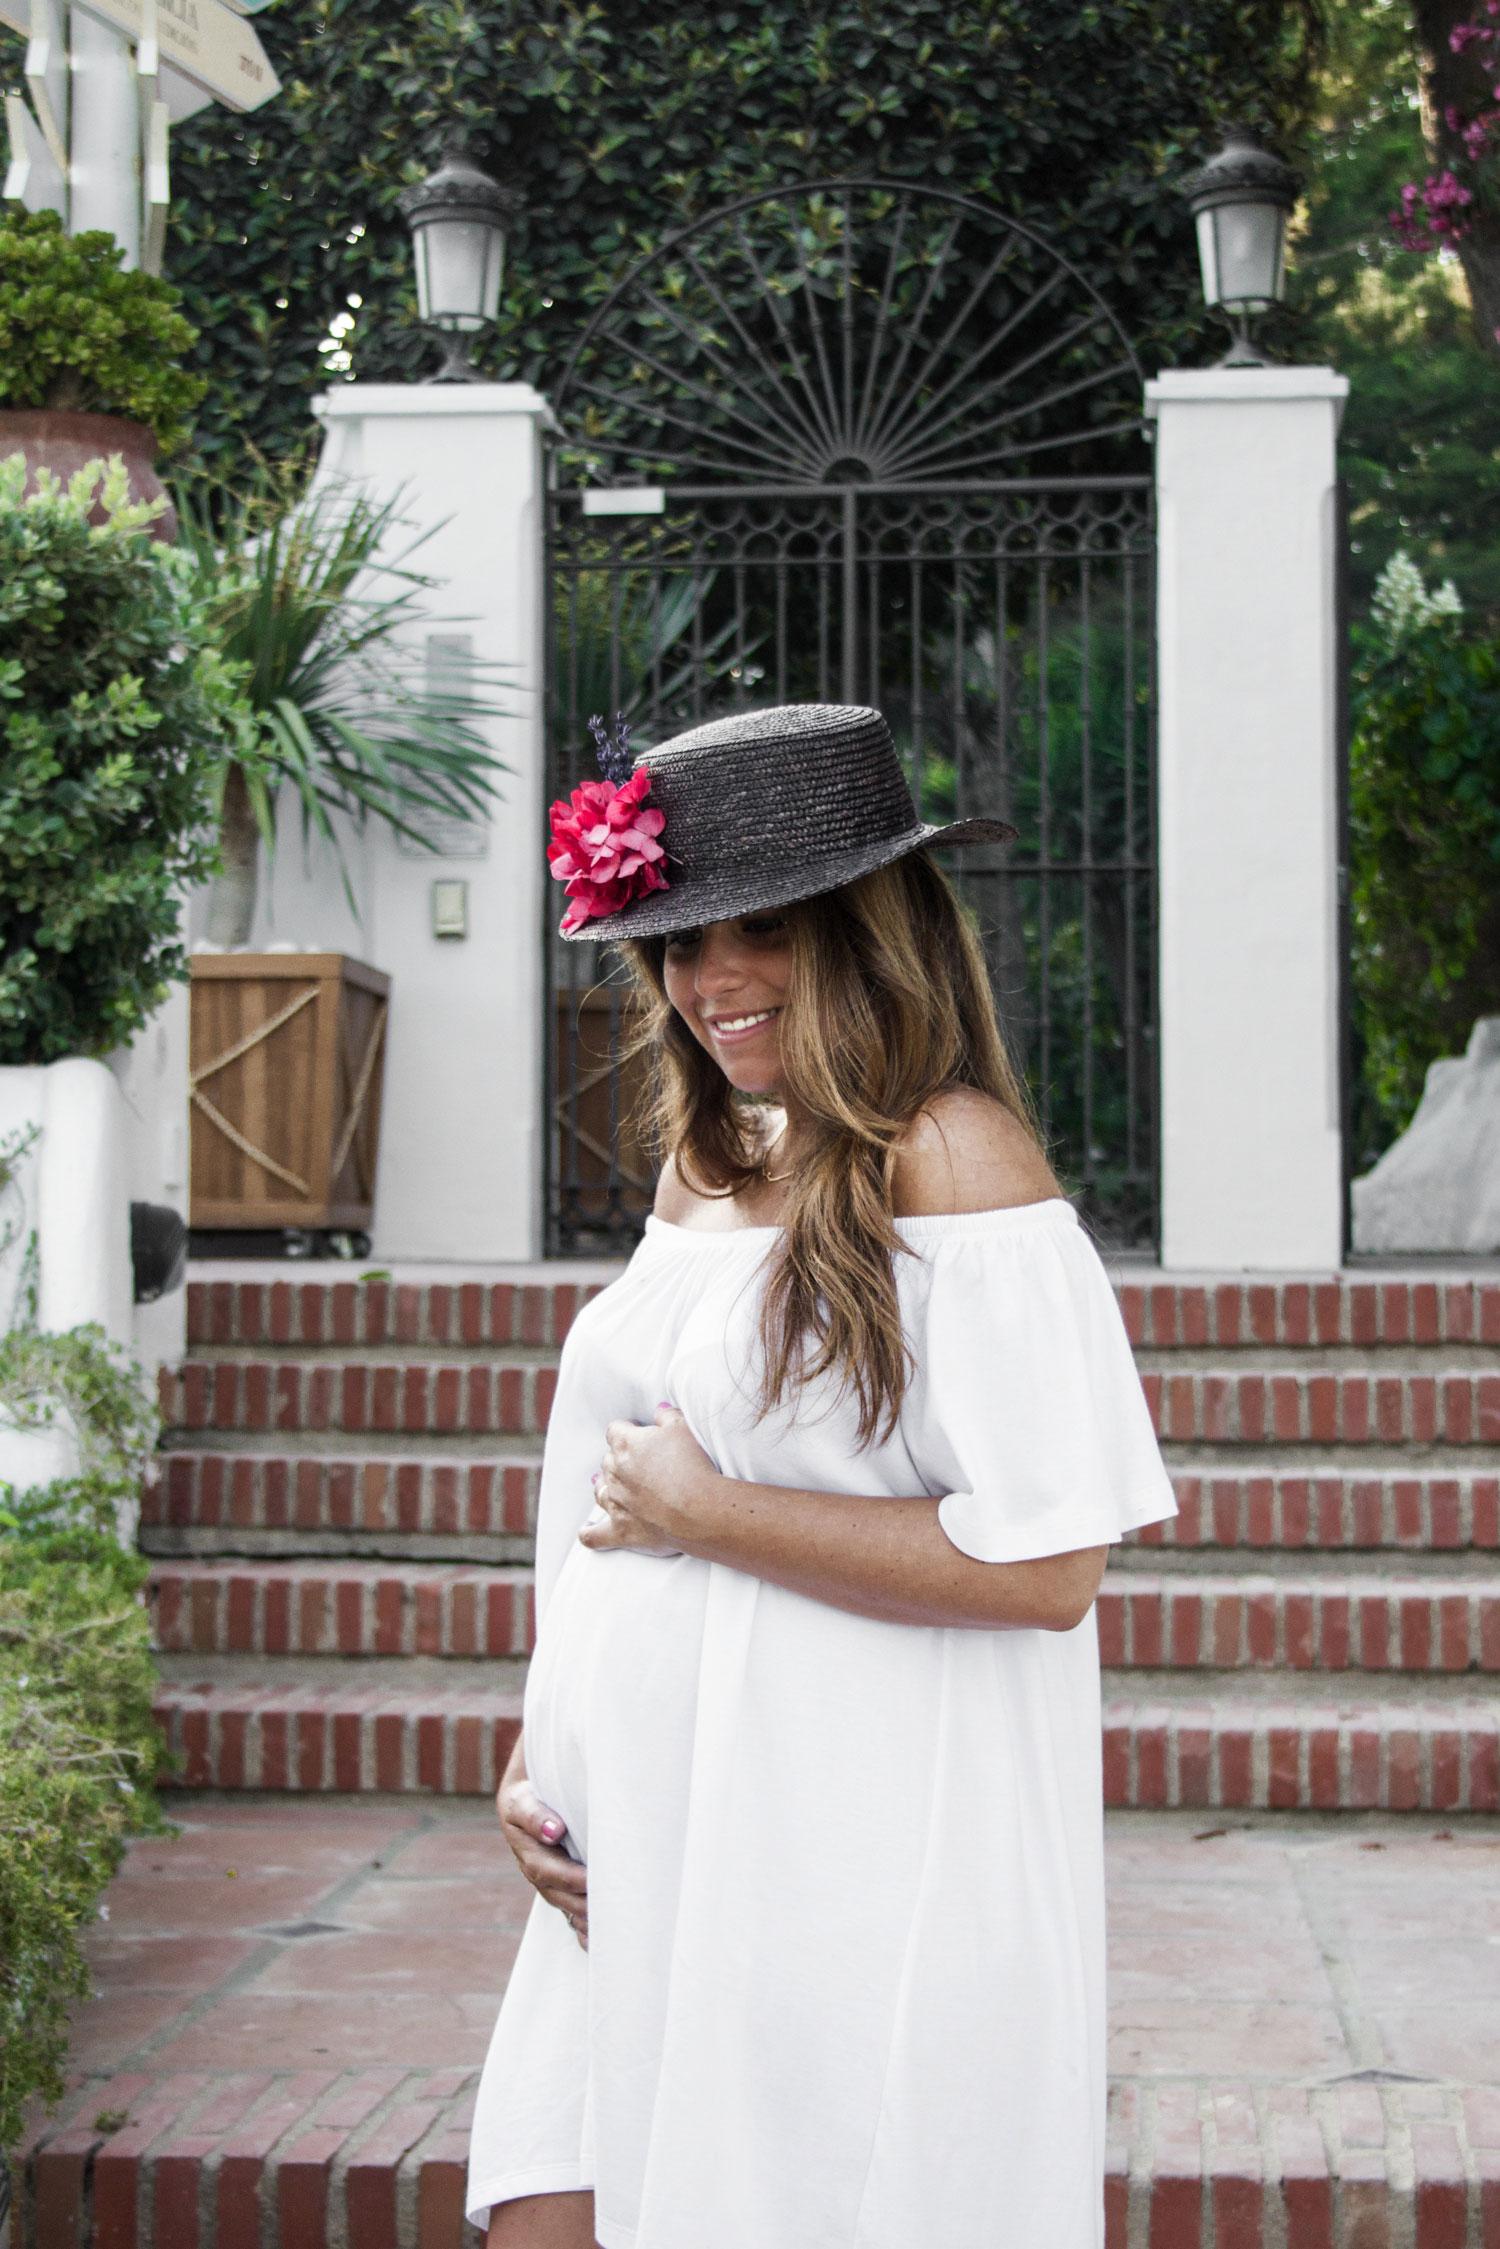 madeinstyle_canotier_sombrero_paja_le_manin_summer_hat-21